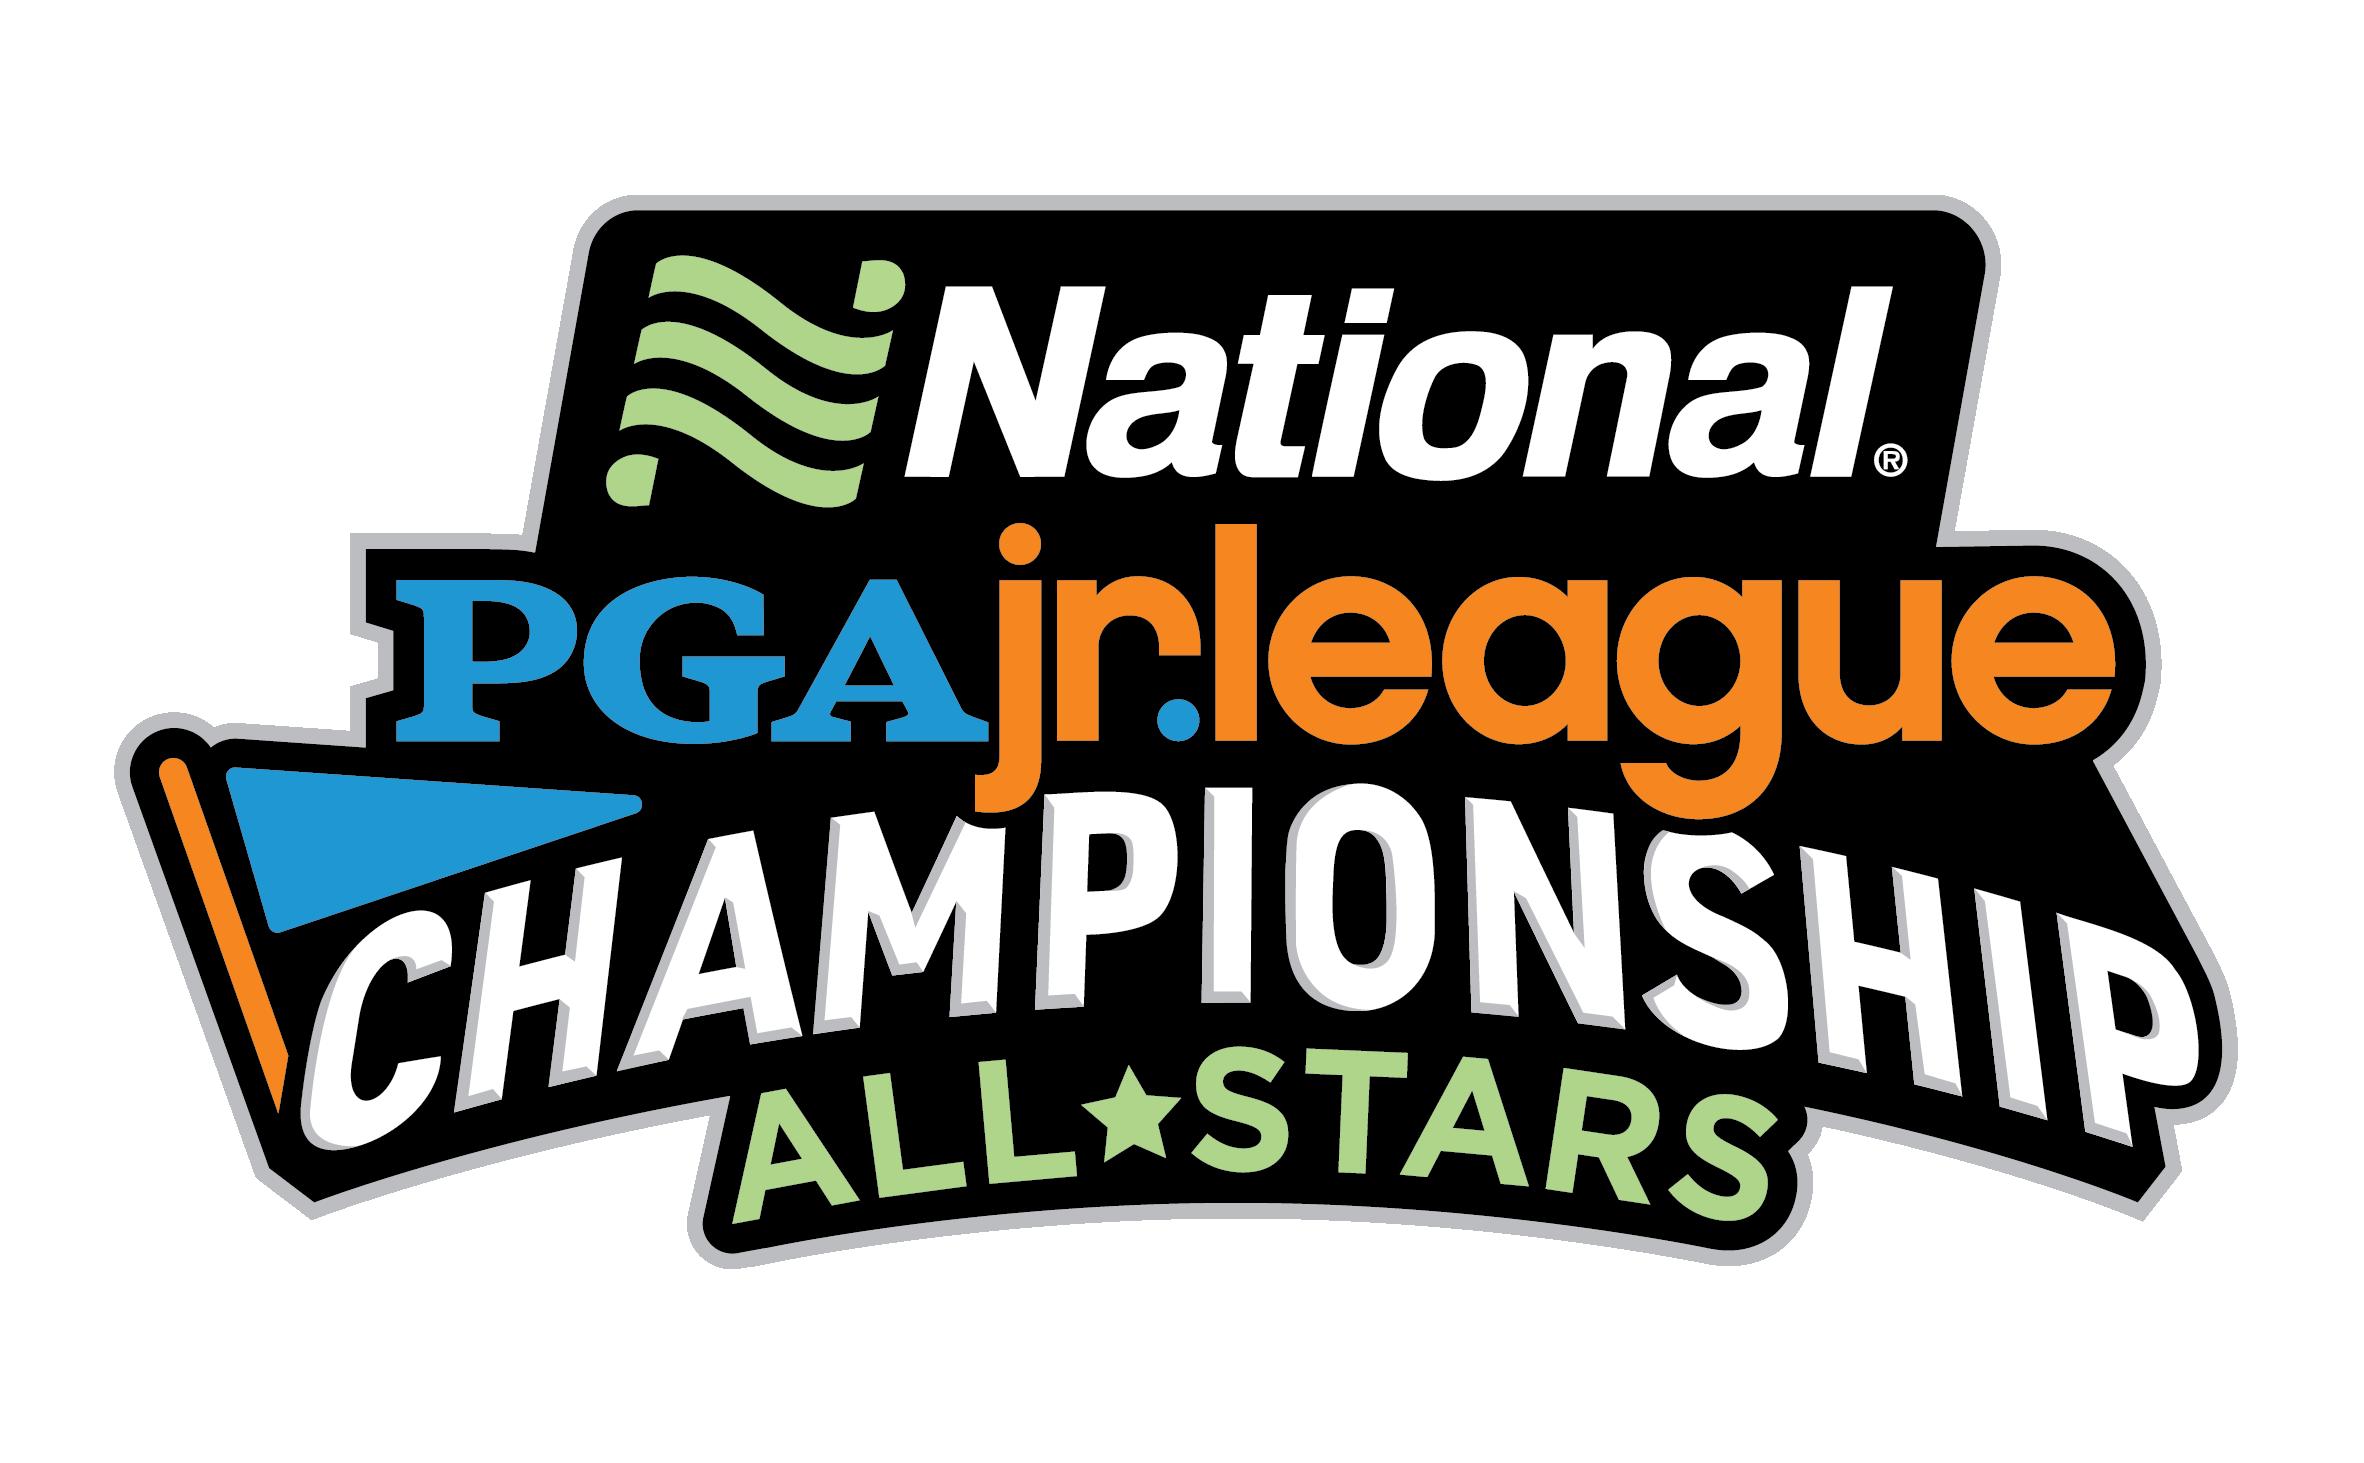 National Car Rental PGA Jr. League Championship Season